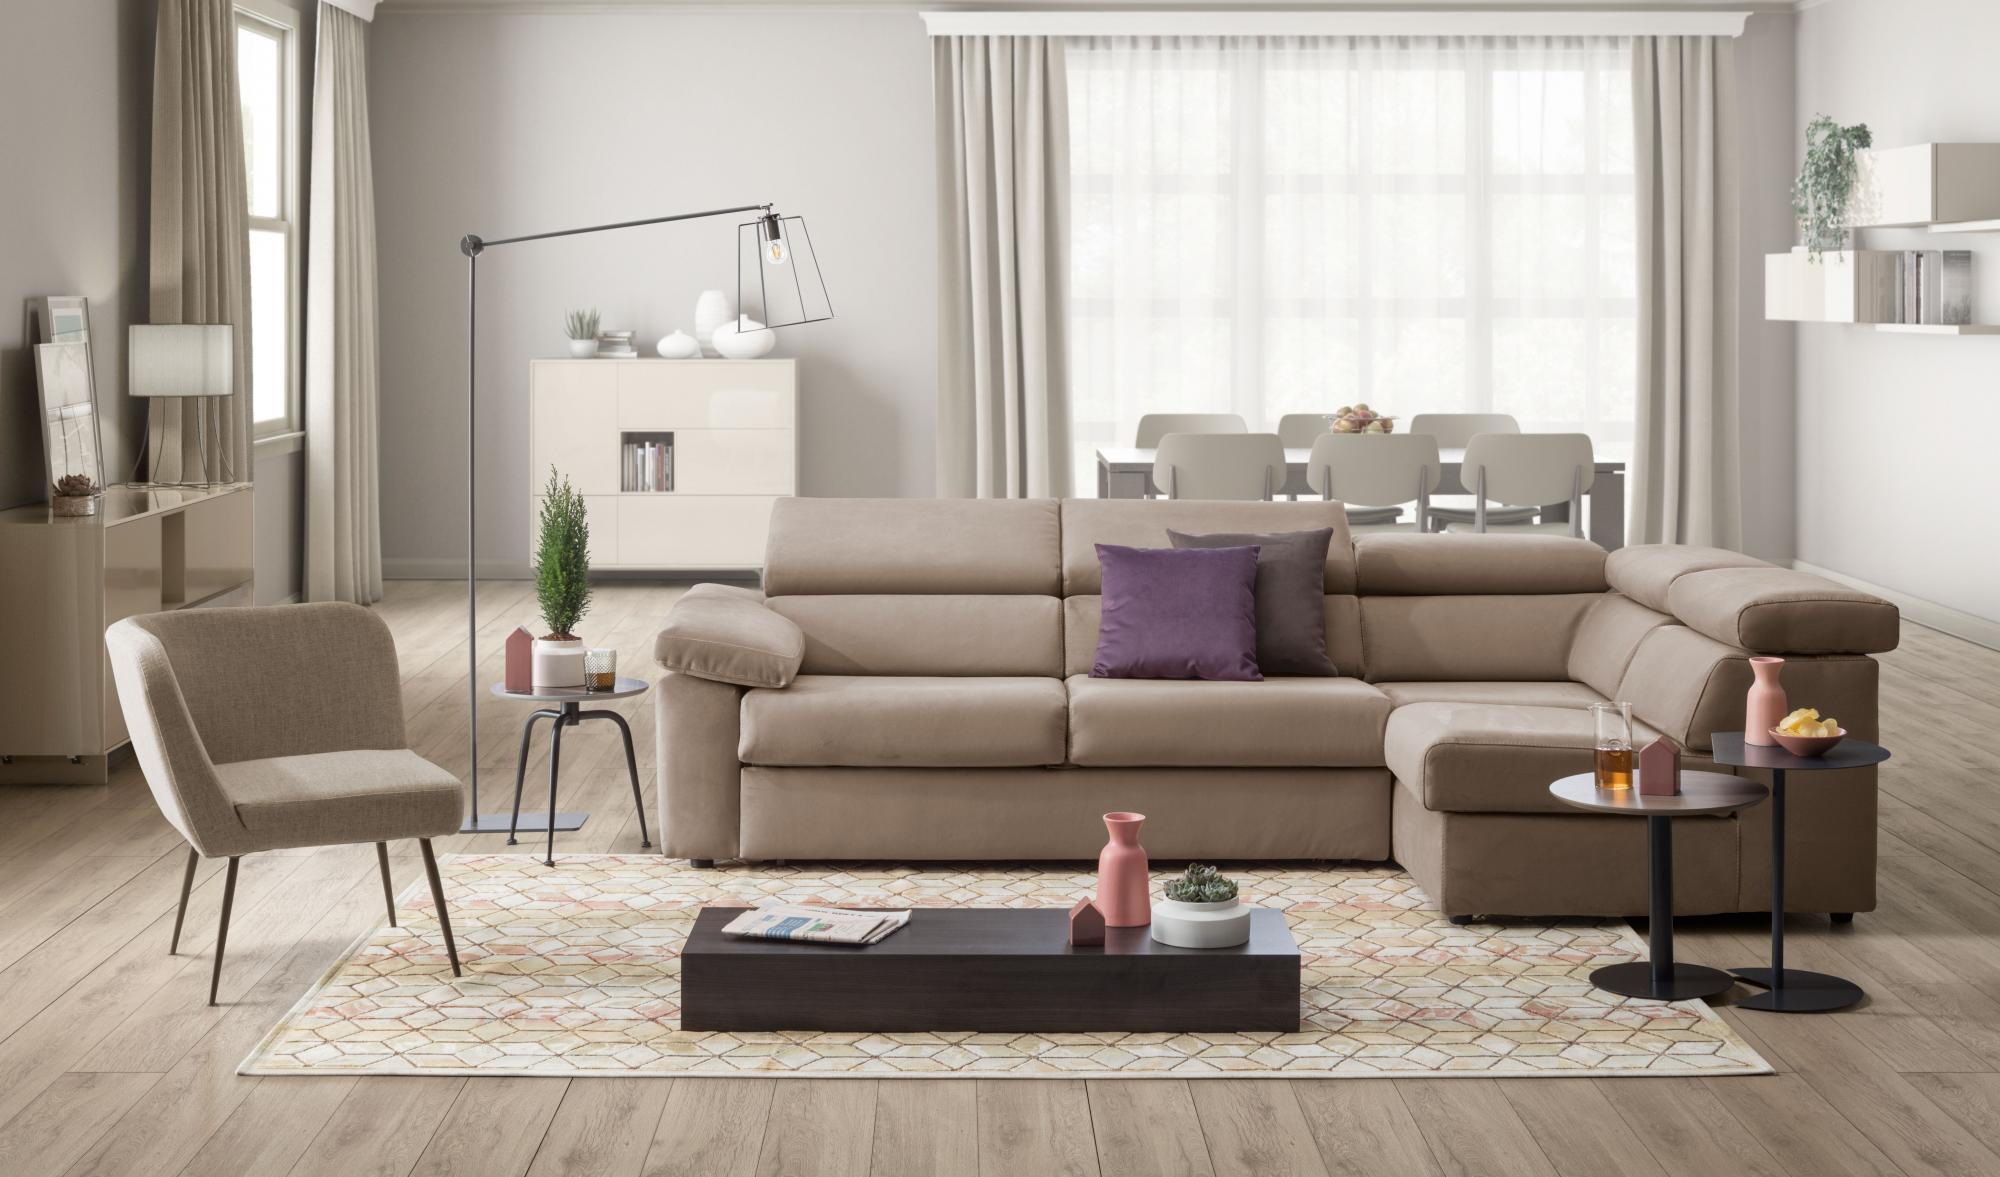 Fusion D3 - Living room - Sofa - Colombini Casa